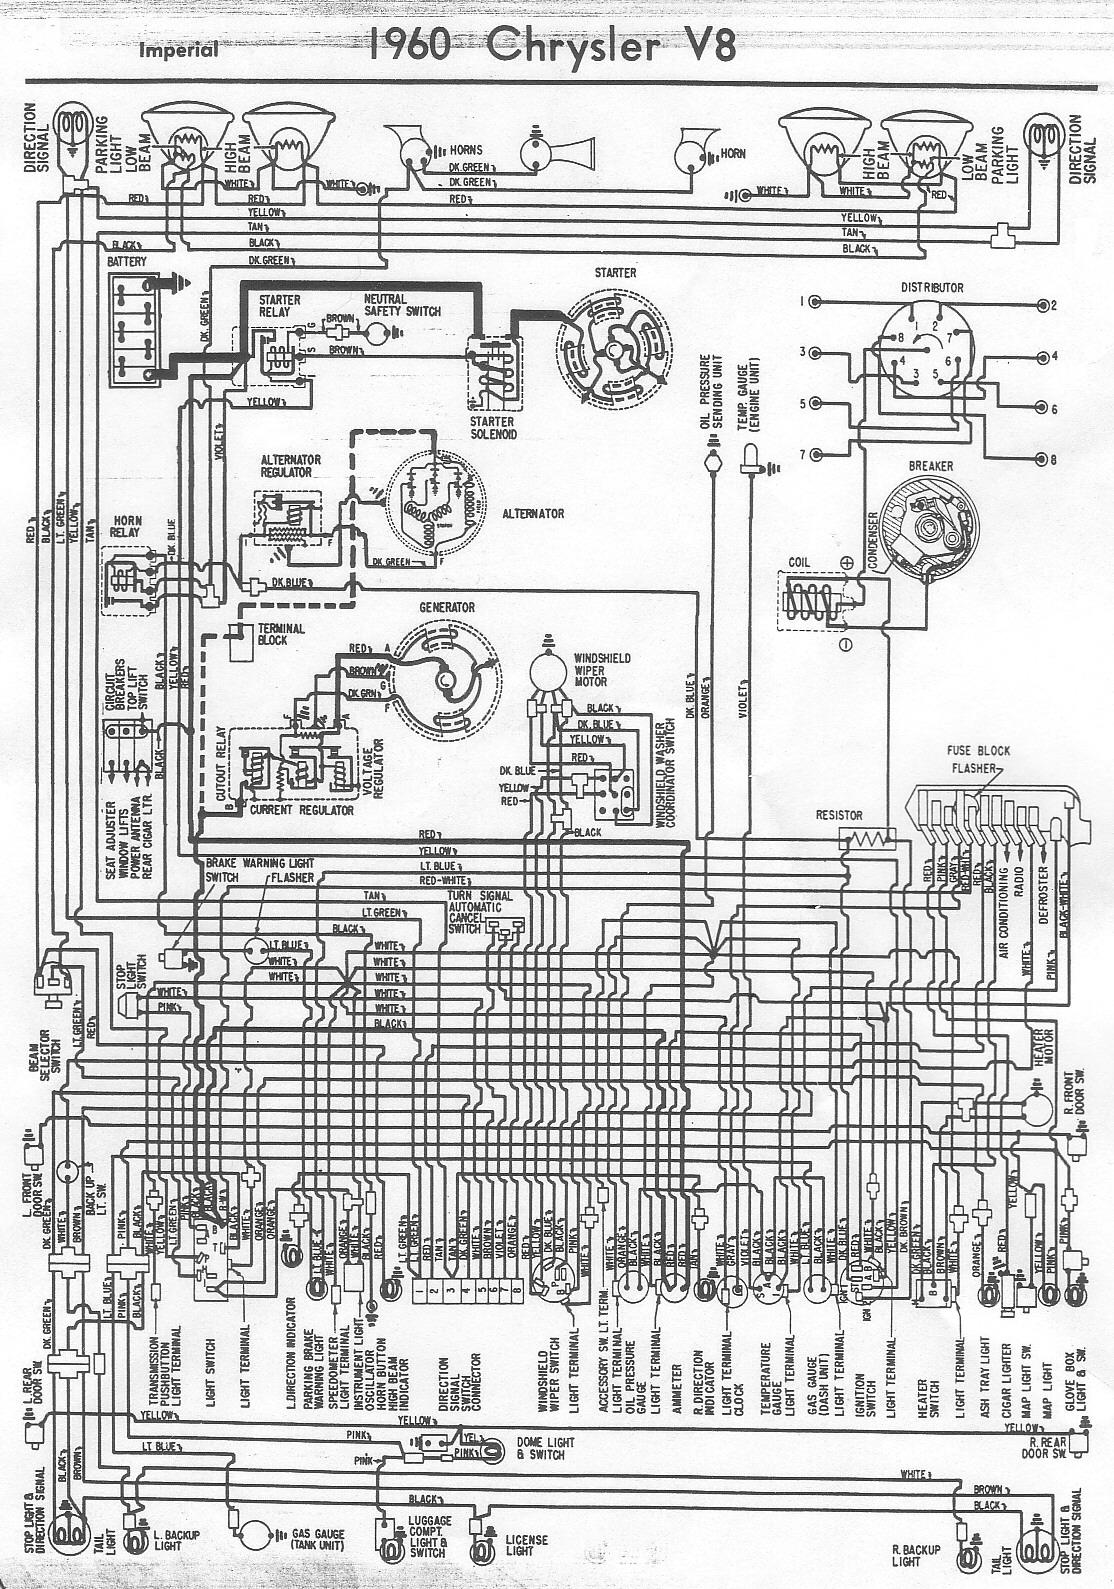 1961 chrysler wiring diagram - wiring diagram schemas  wiring diagram schemas